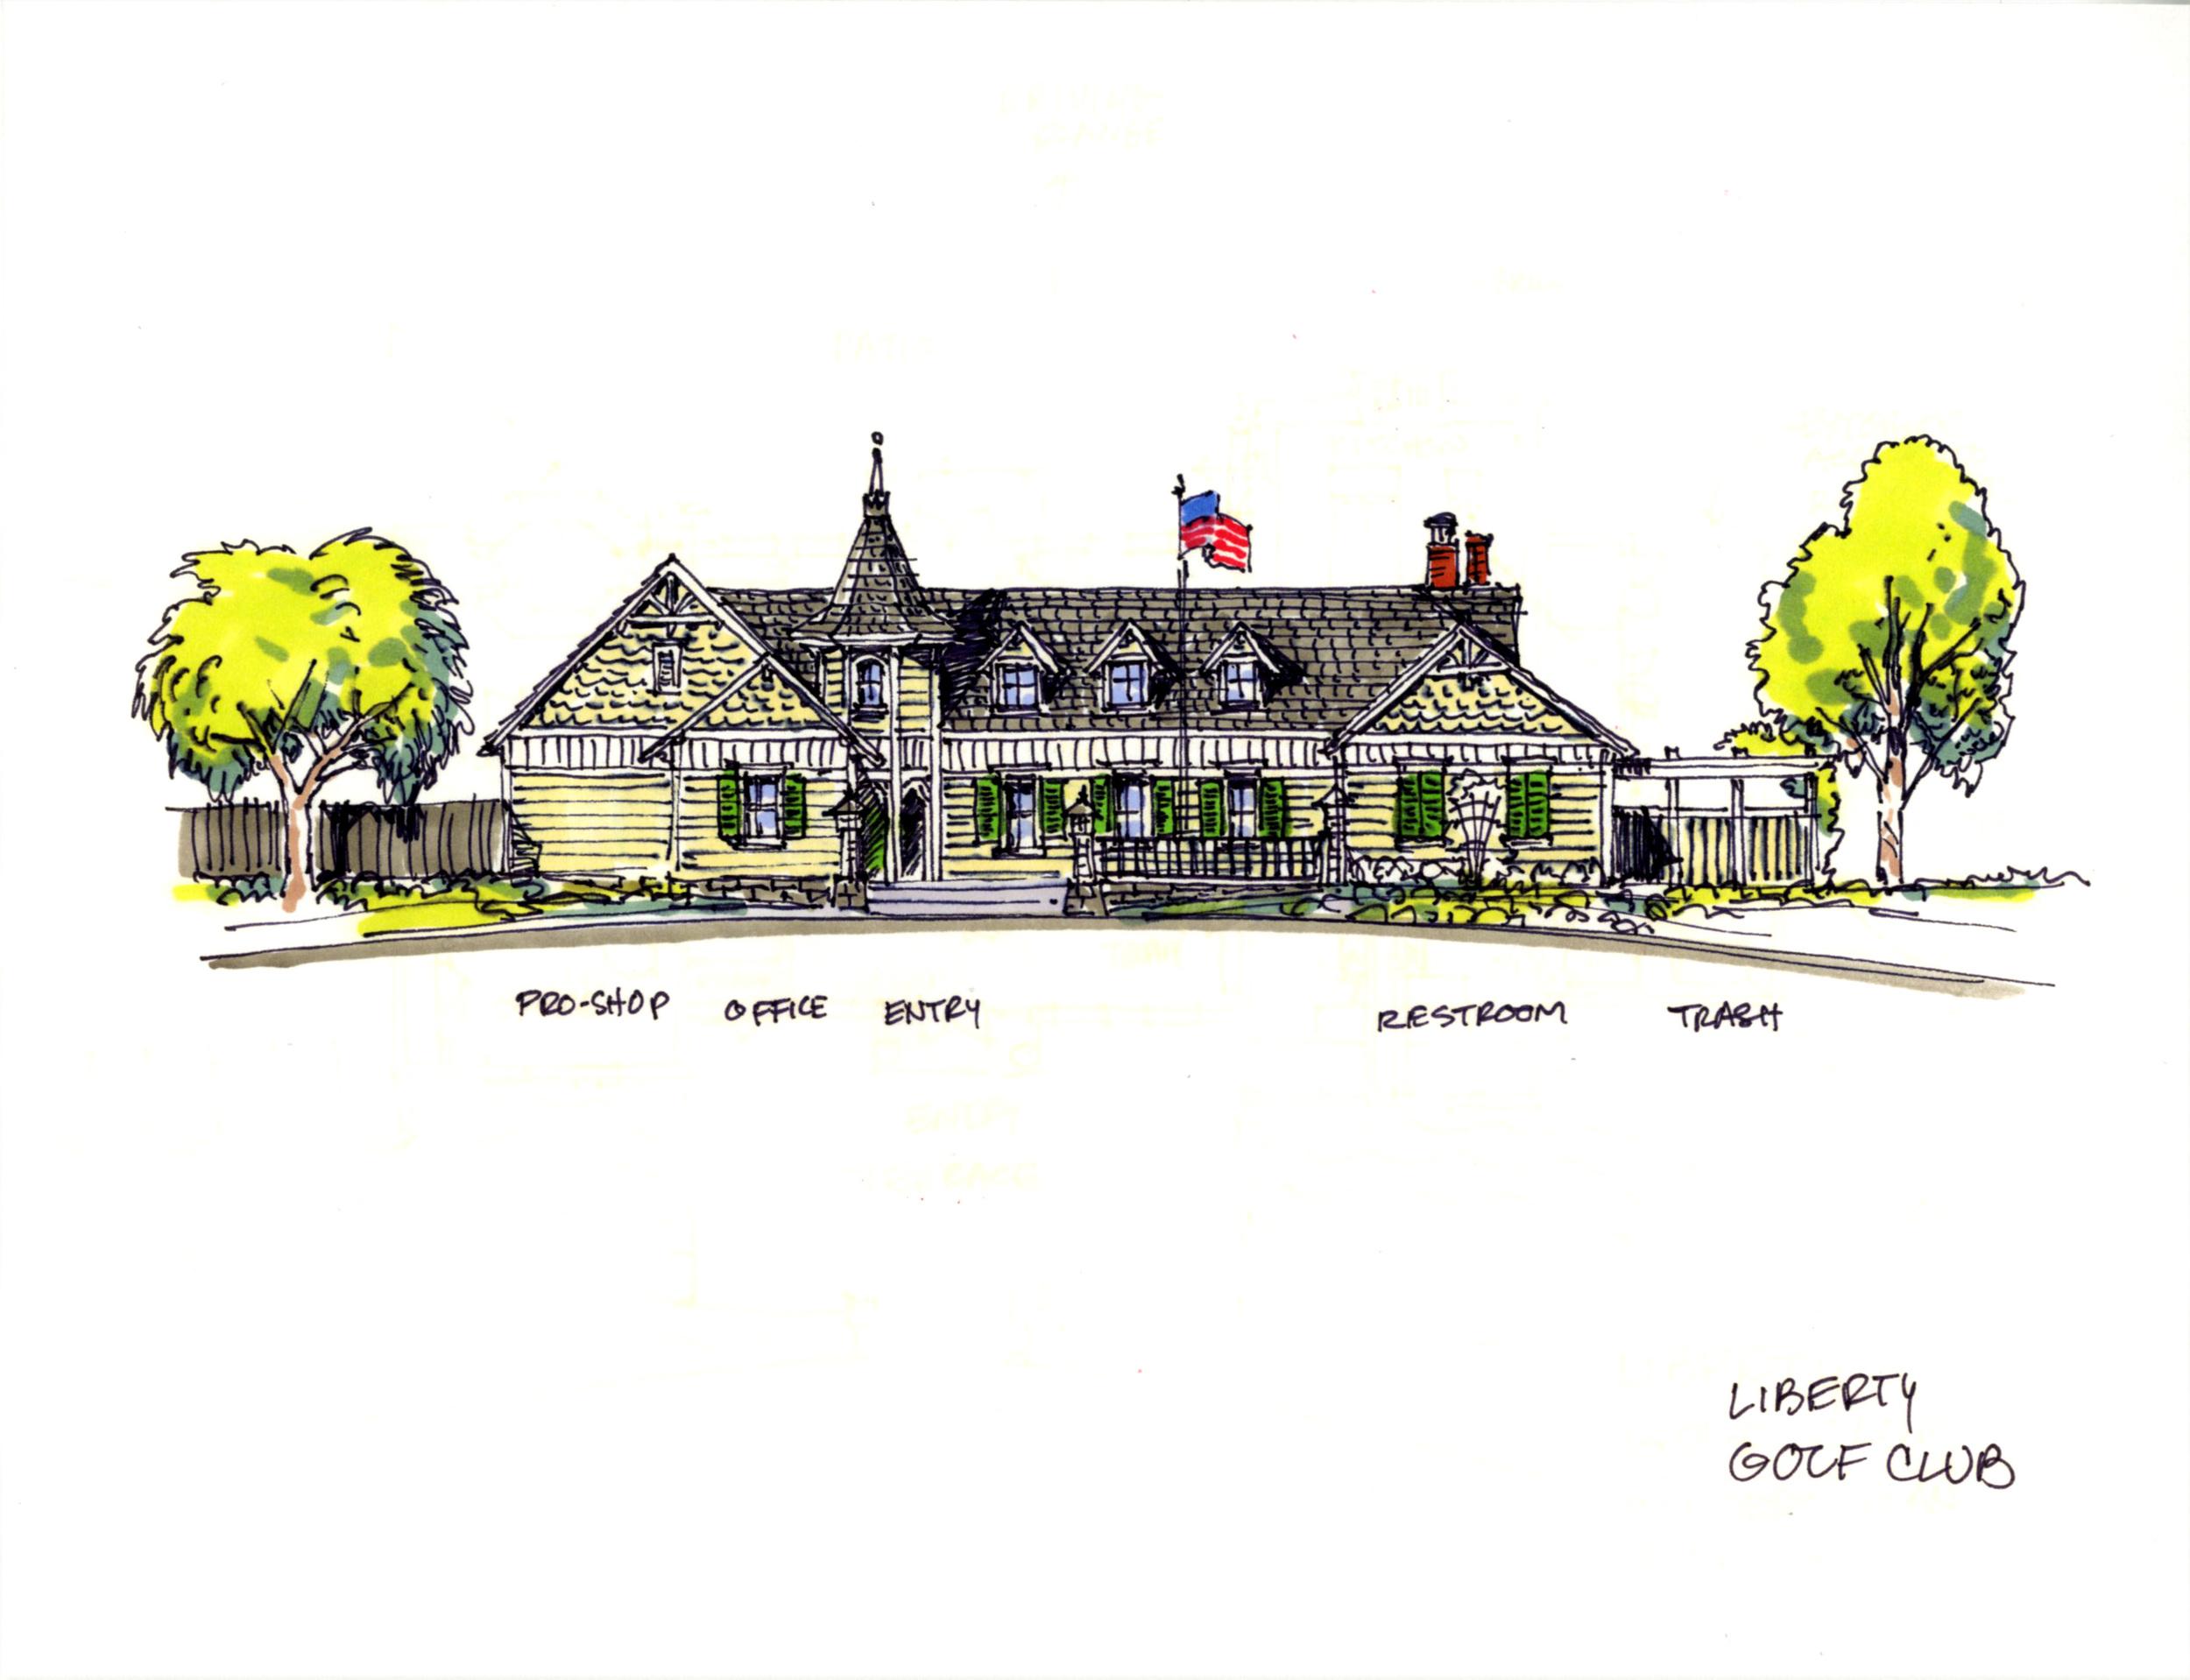 Liberty Golf Club209.jpg